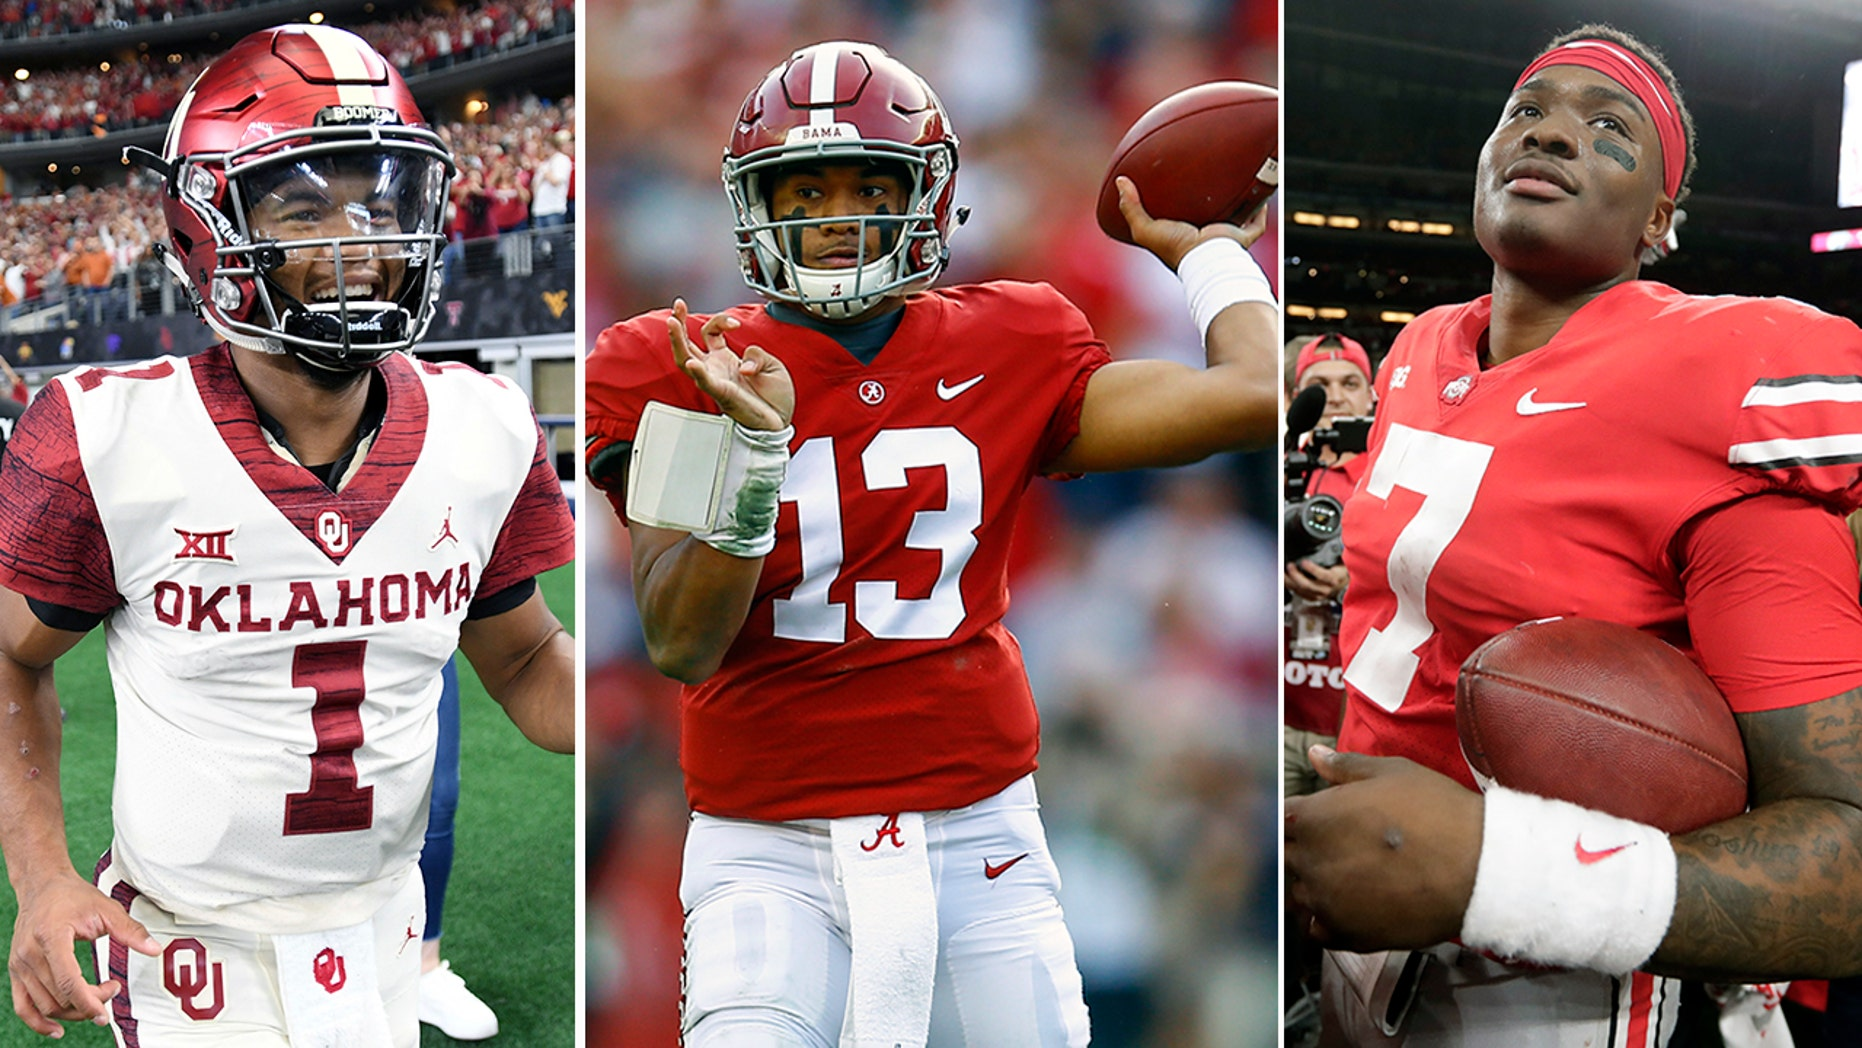 FROM LEFT: Oklahoma quarterback Kyler Murray, Alabama quarterback Tua Tagovailoa and Ohio State quarterback Dwayne Haskins (AP Photo/Butch Dill)